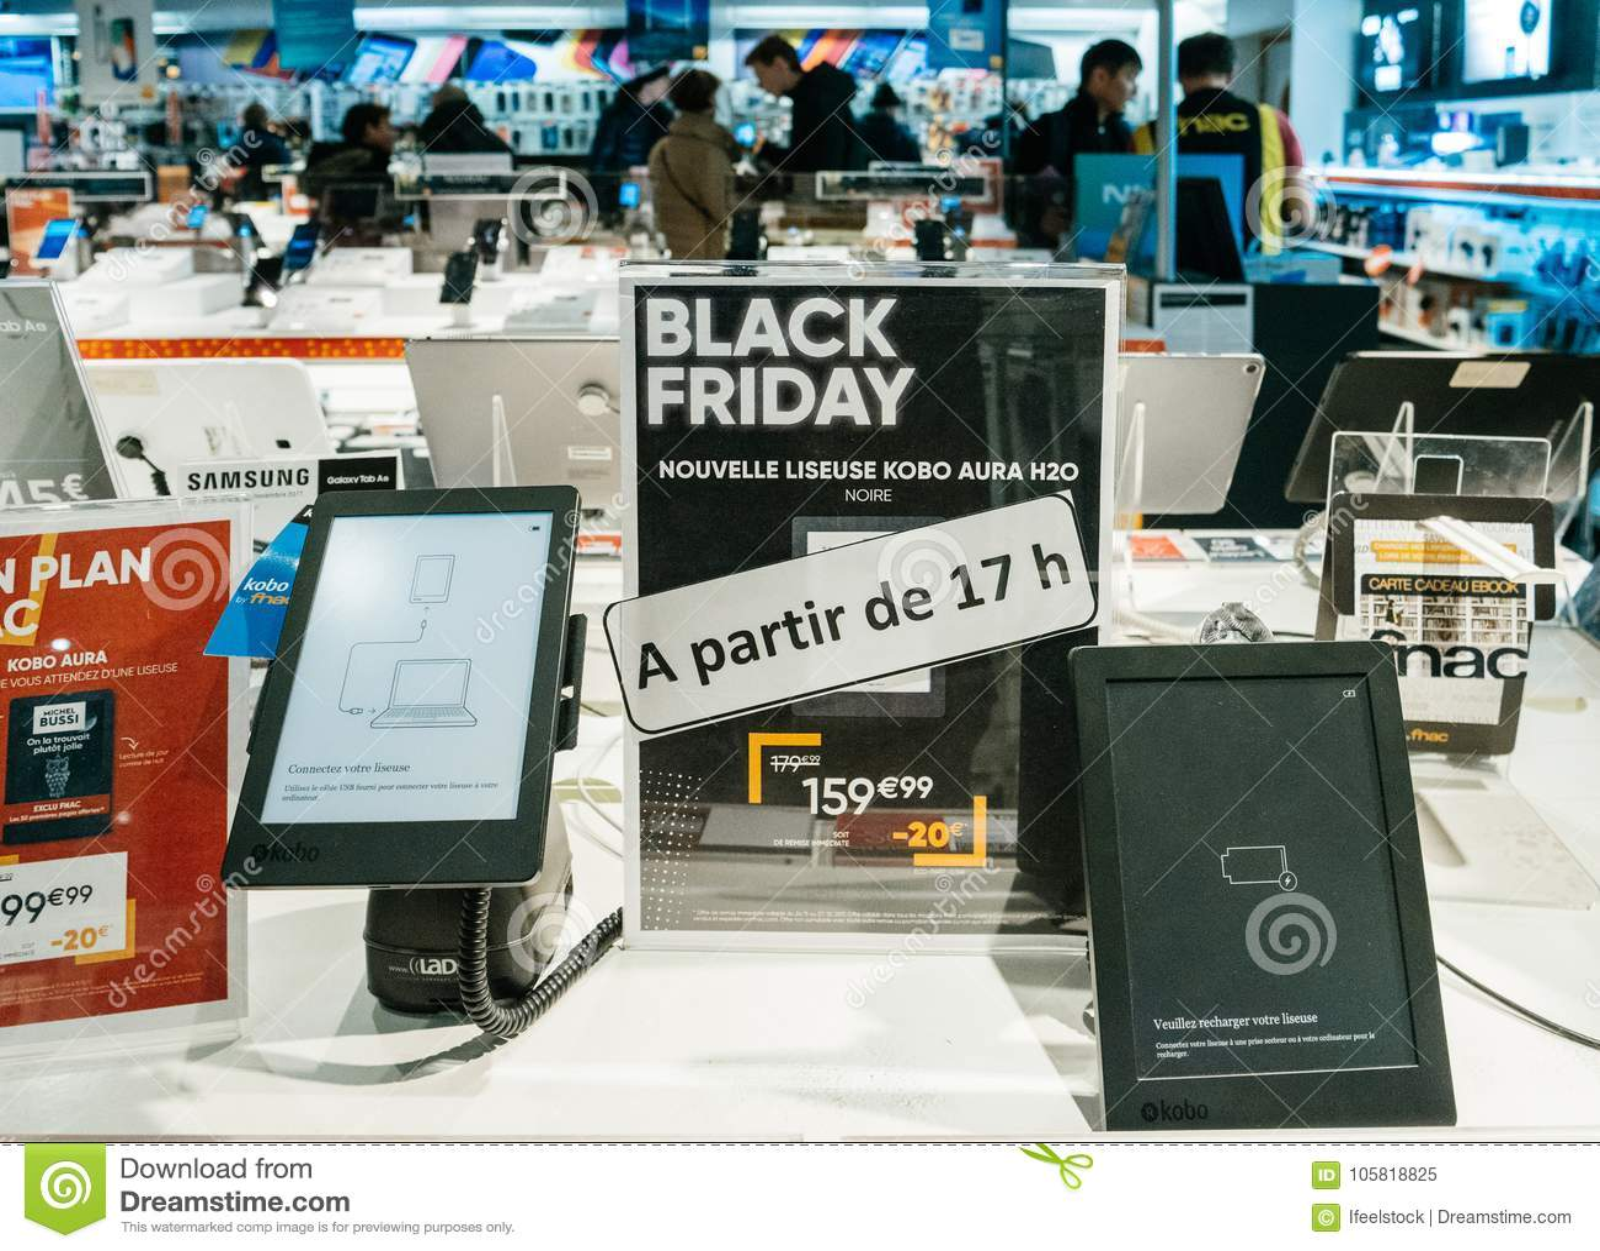 71578b9d7c Black Friday Sale Of Electronics At FNAC Store Kobo